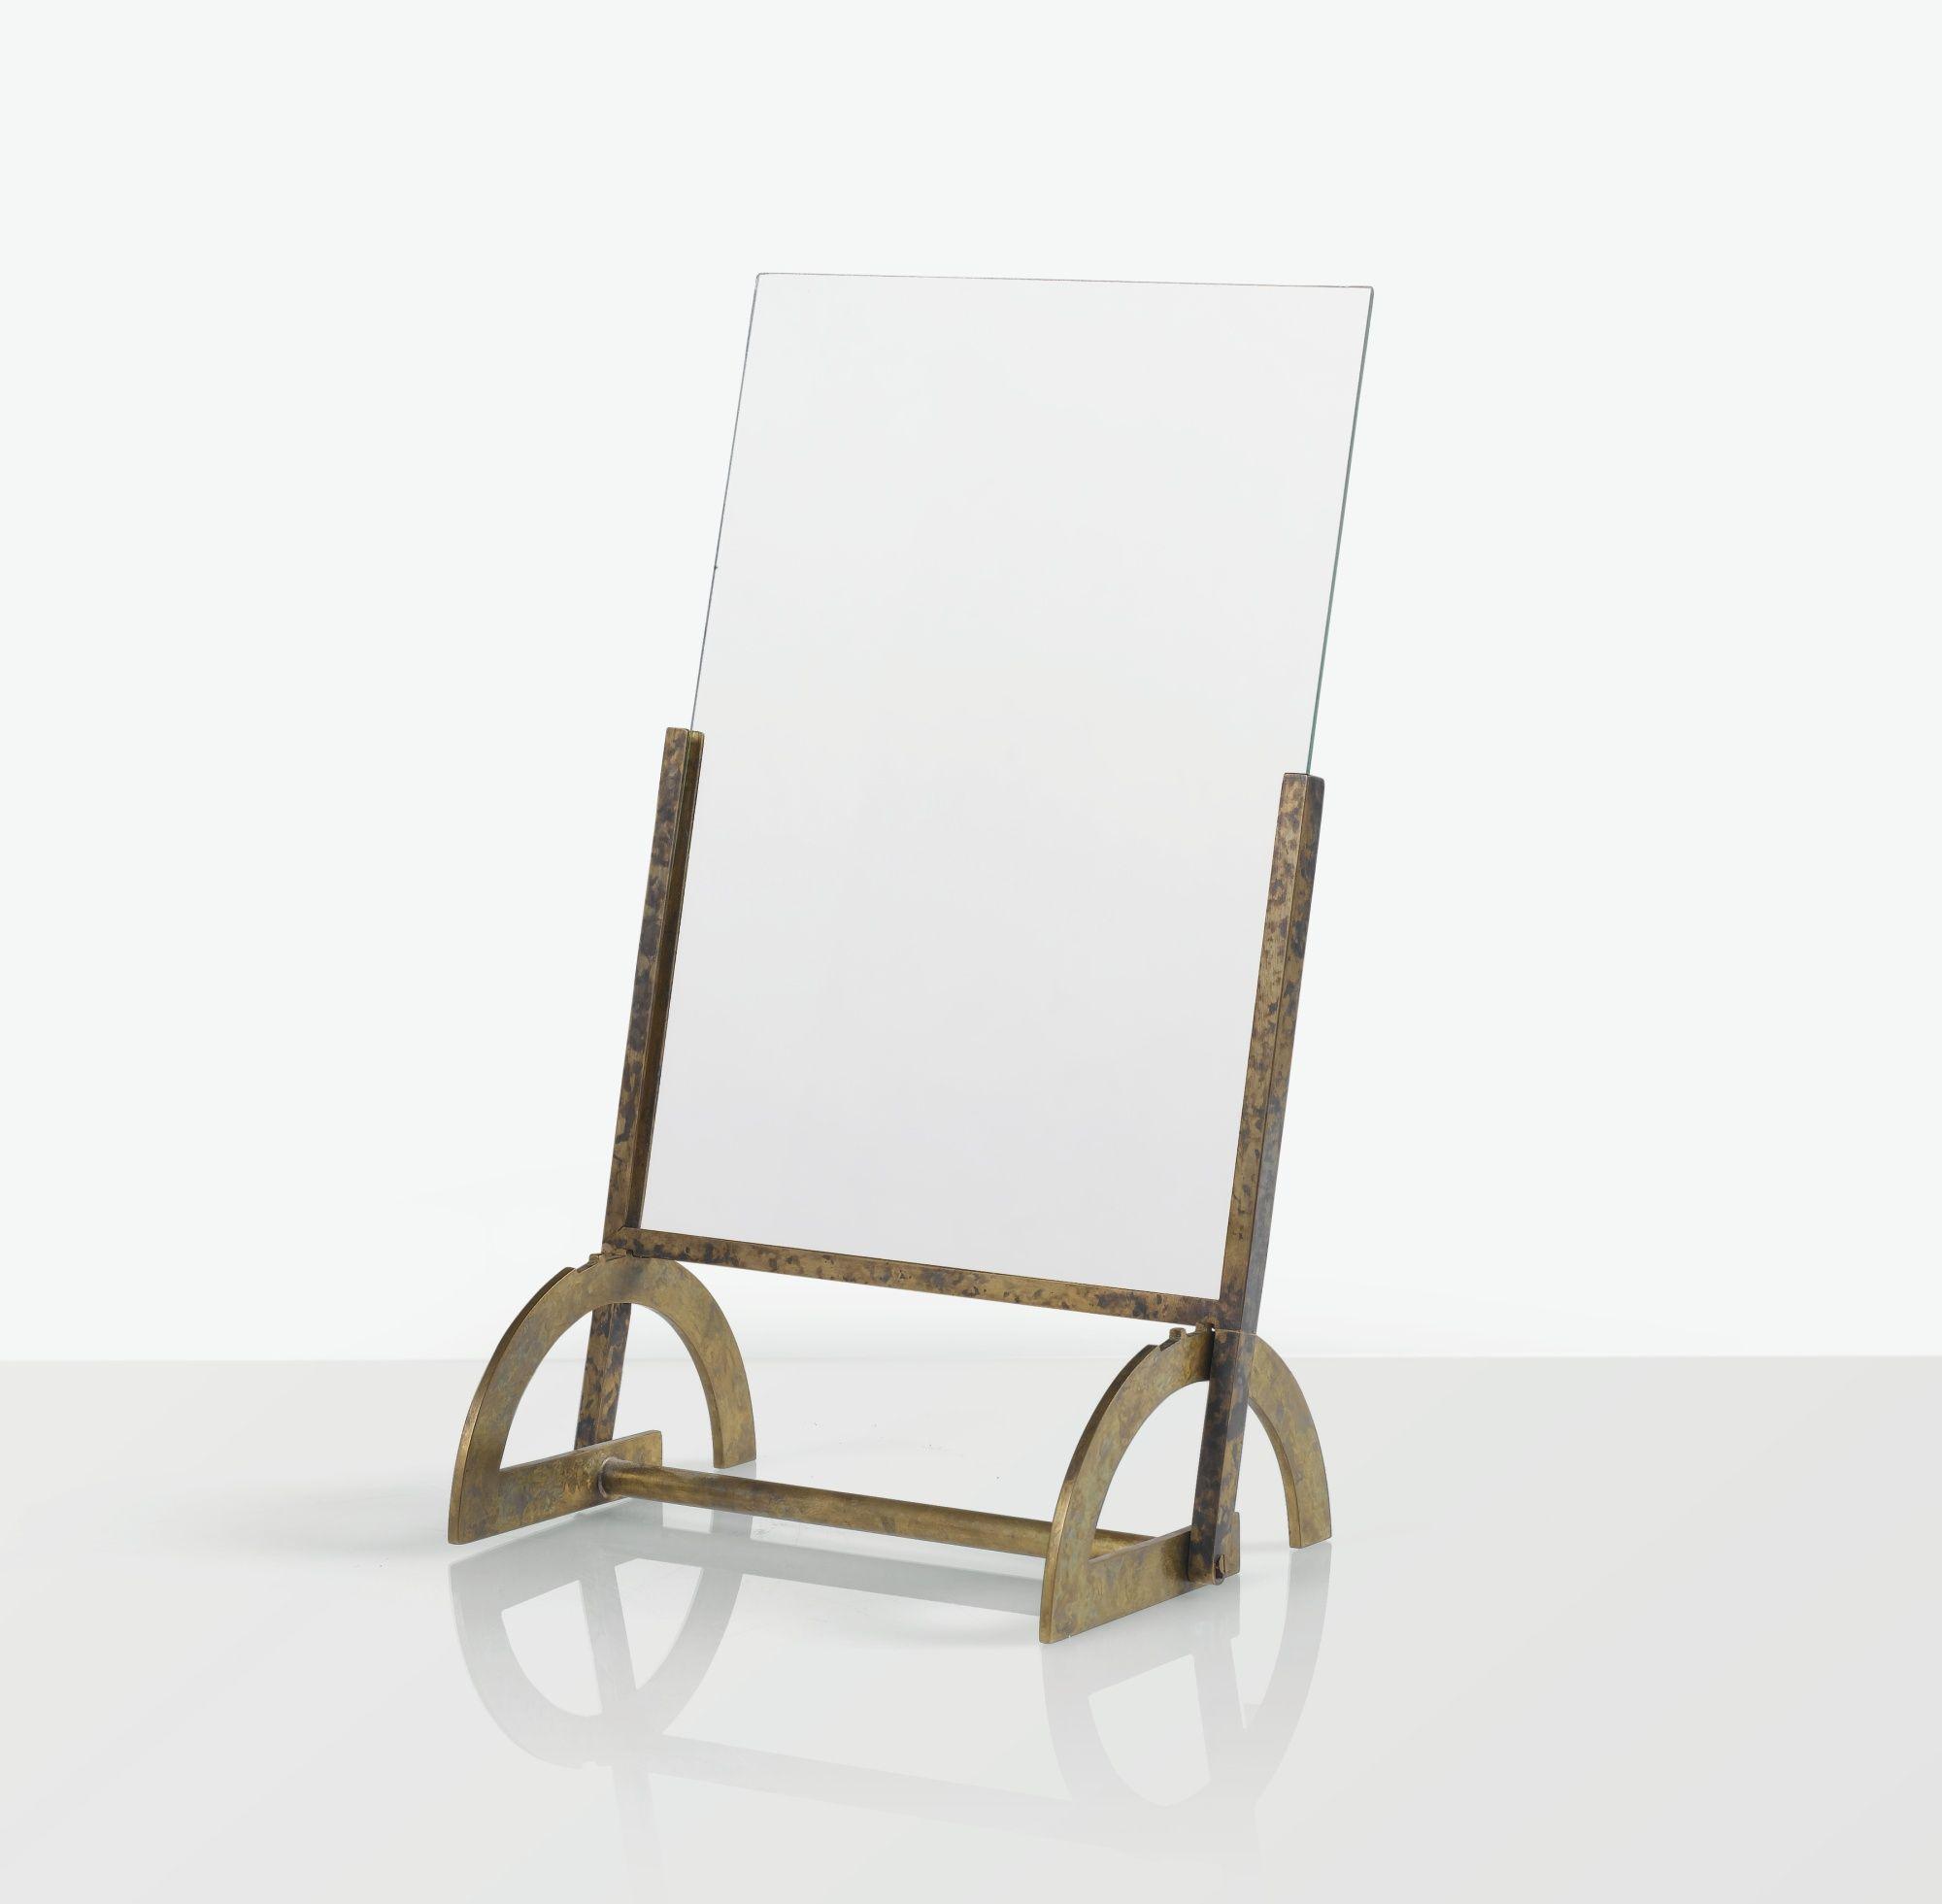 Eugène Printz; Brass and Glass Picture Frame, c1940.